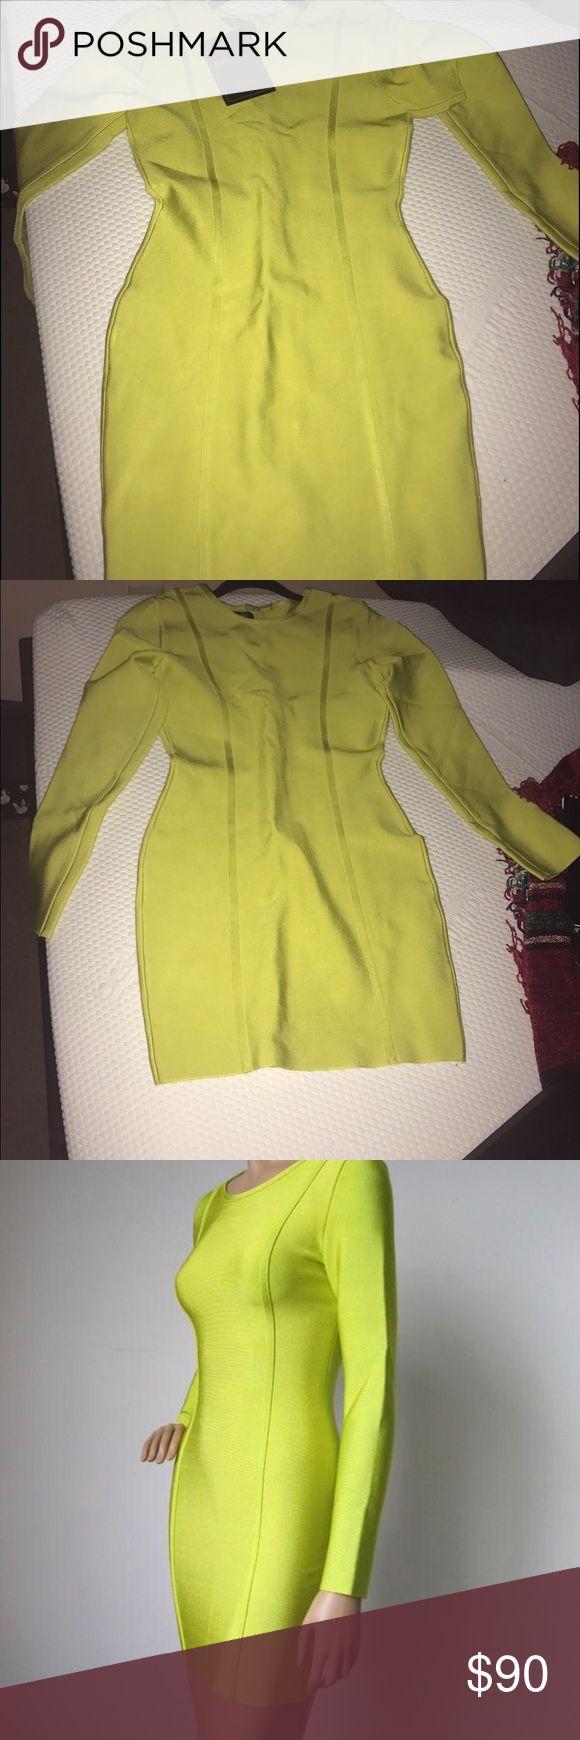 Celeb Boutique Bodycon Long sleeve Bandage Dress Beautiful Brand New Bodycon Bandage Dress Dresses Long Sleeve